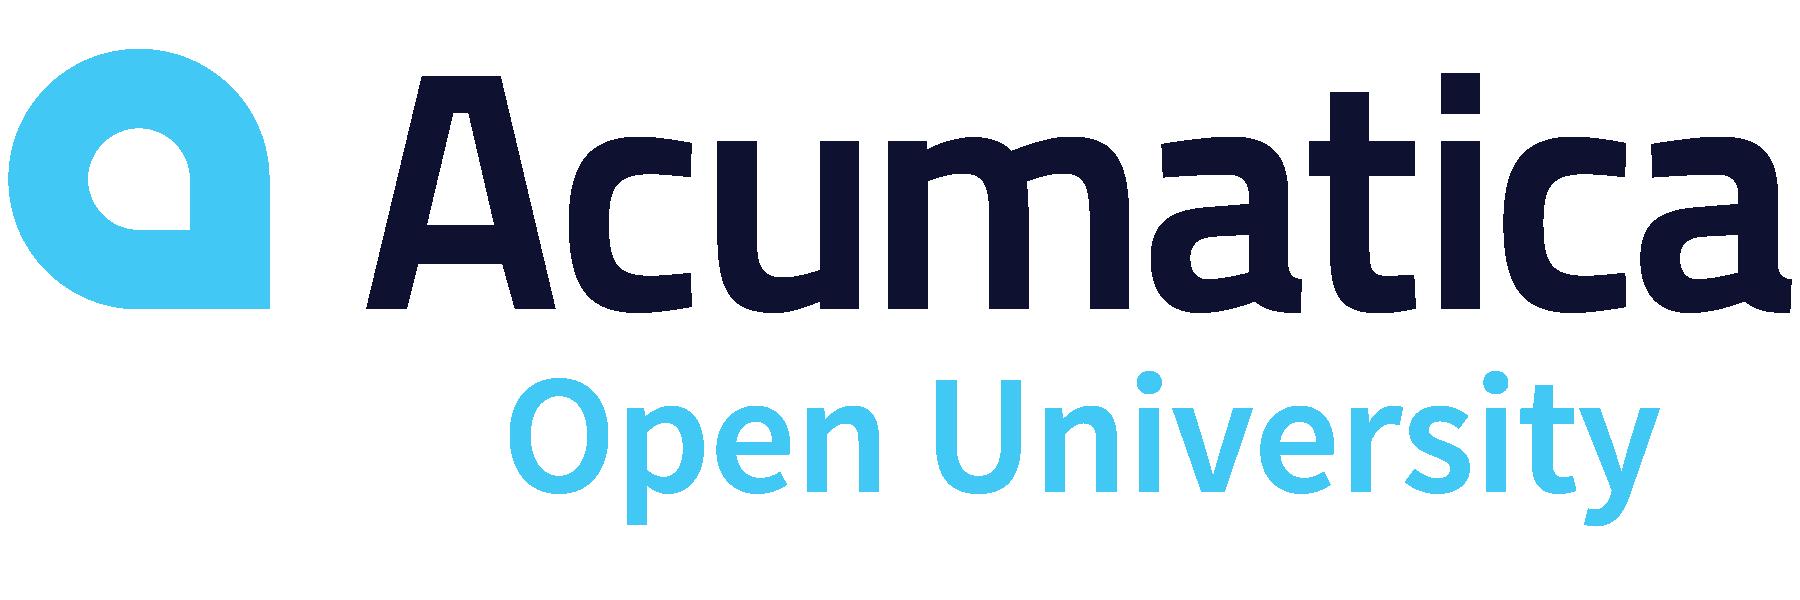 Acumatica Open University